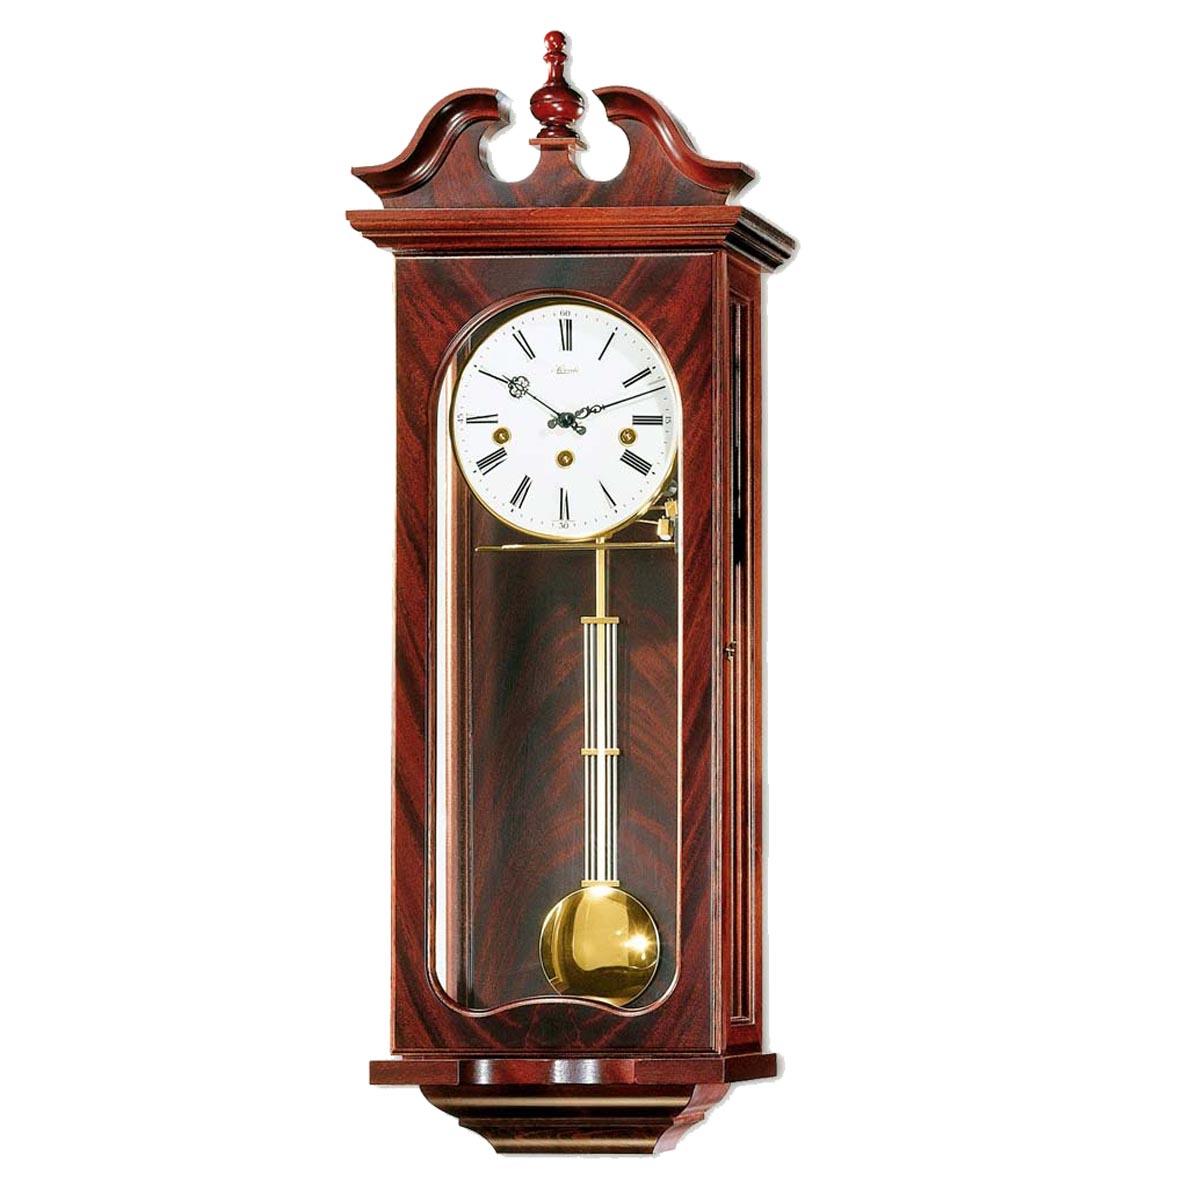 Hermle RAINTON-70742-070341 Regulator Wall Clock